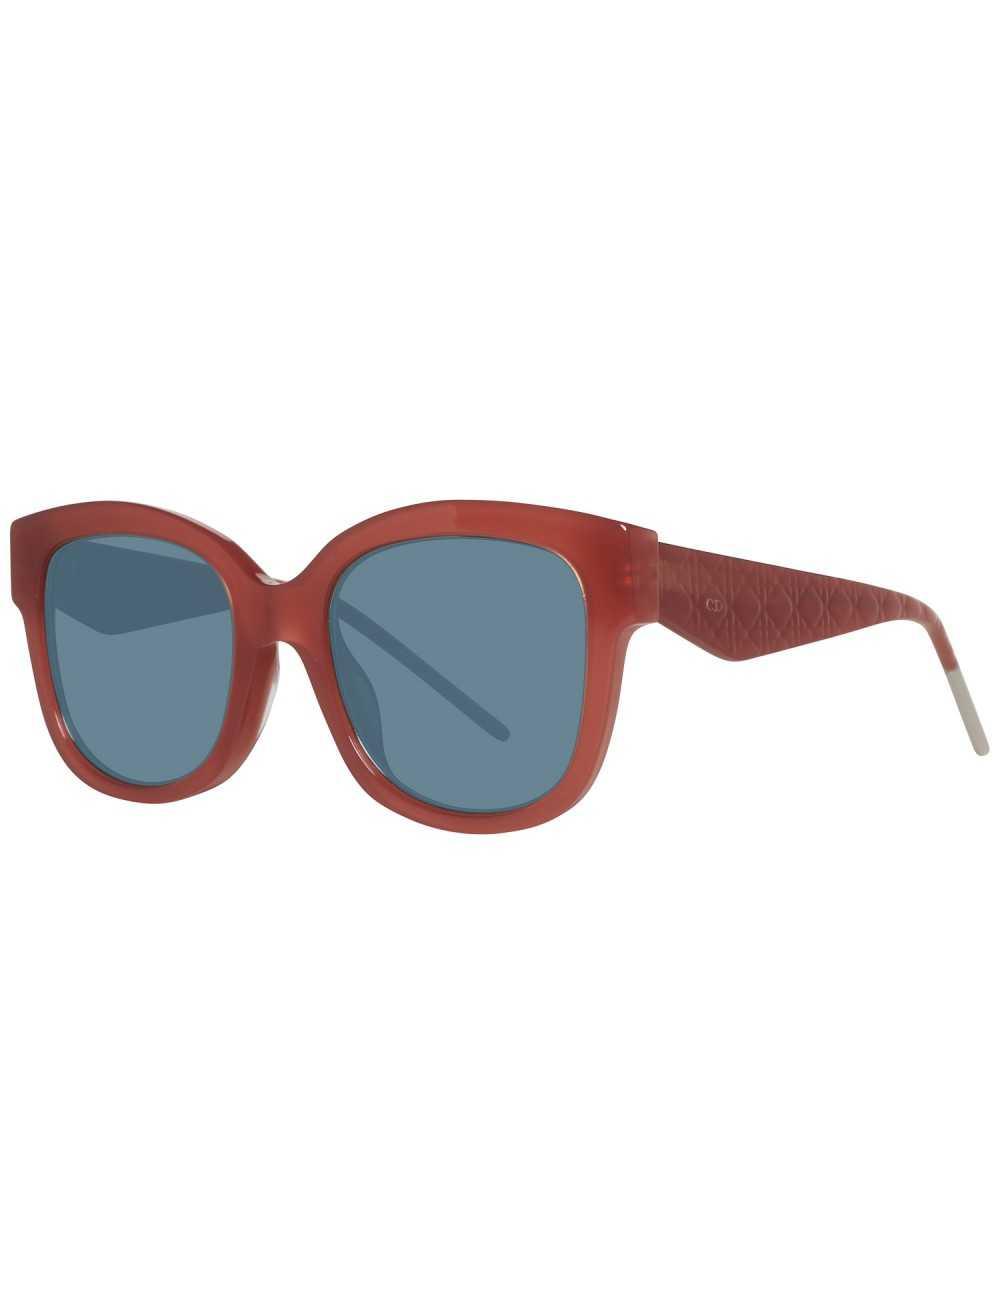 Christian Dior Sunglasses VeryDior1N GGX 519A